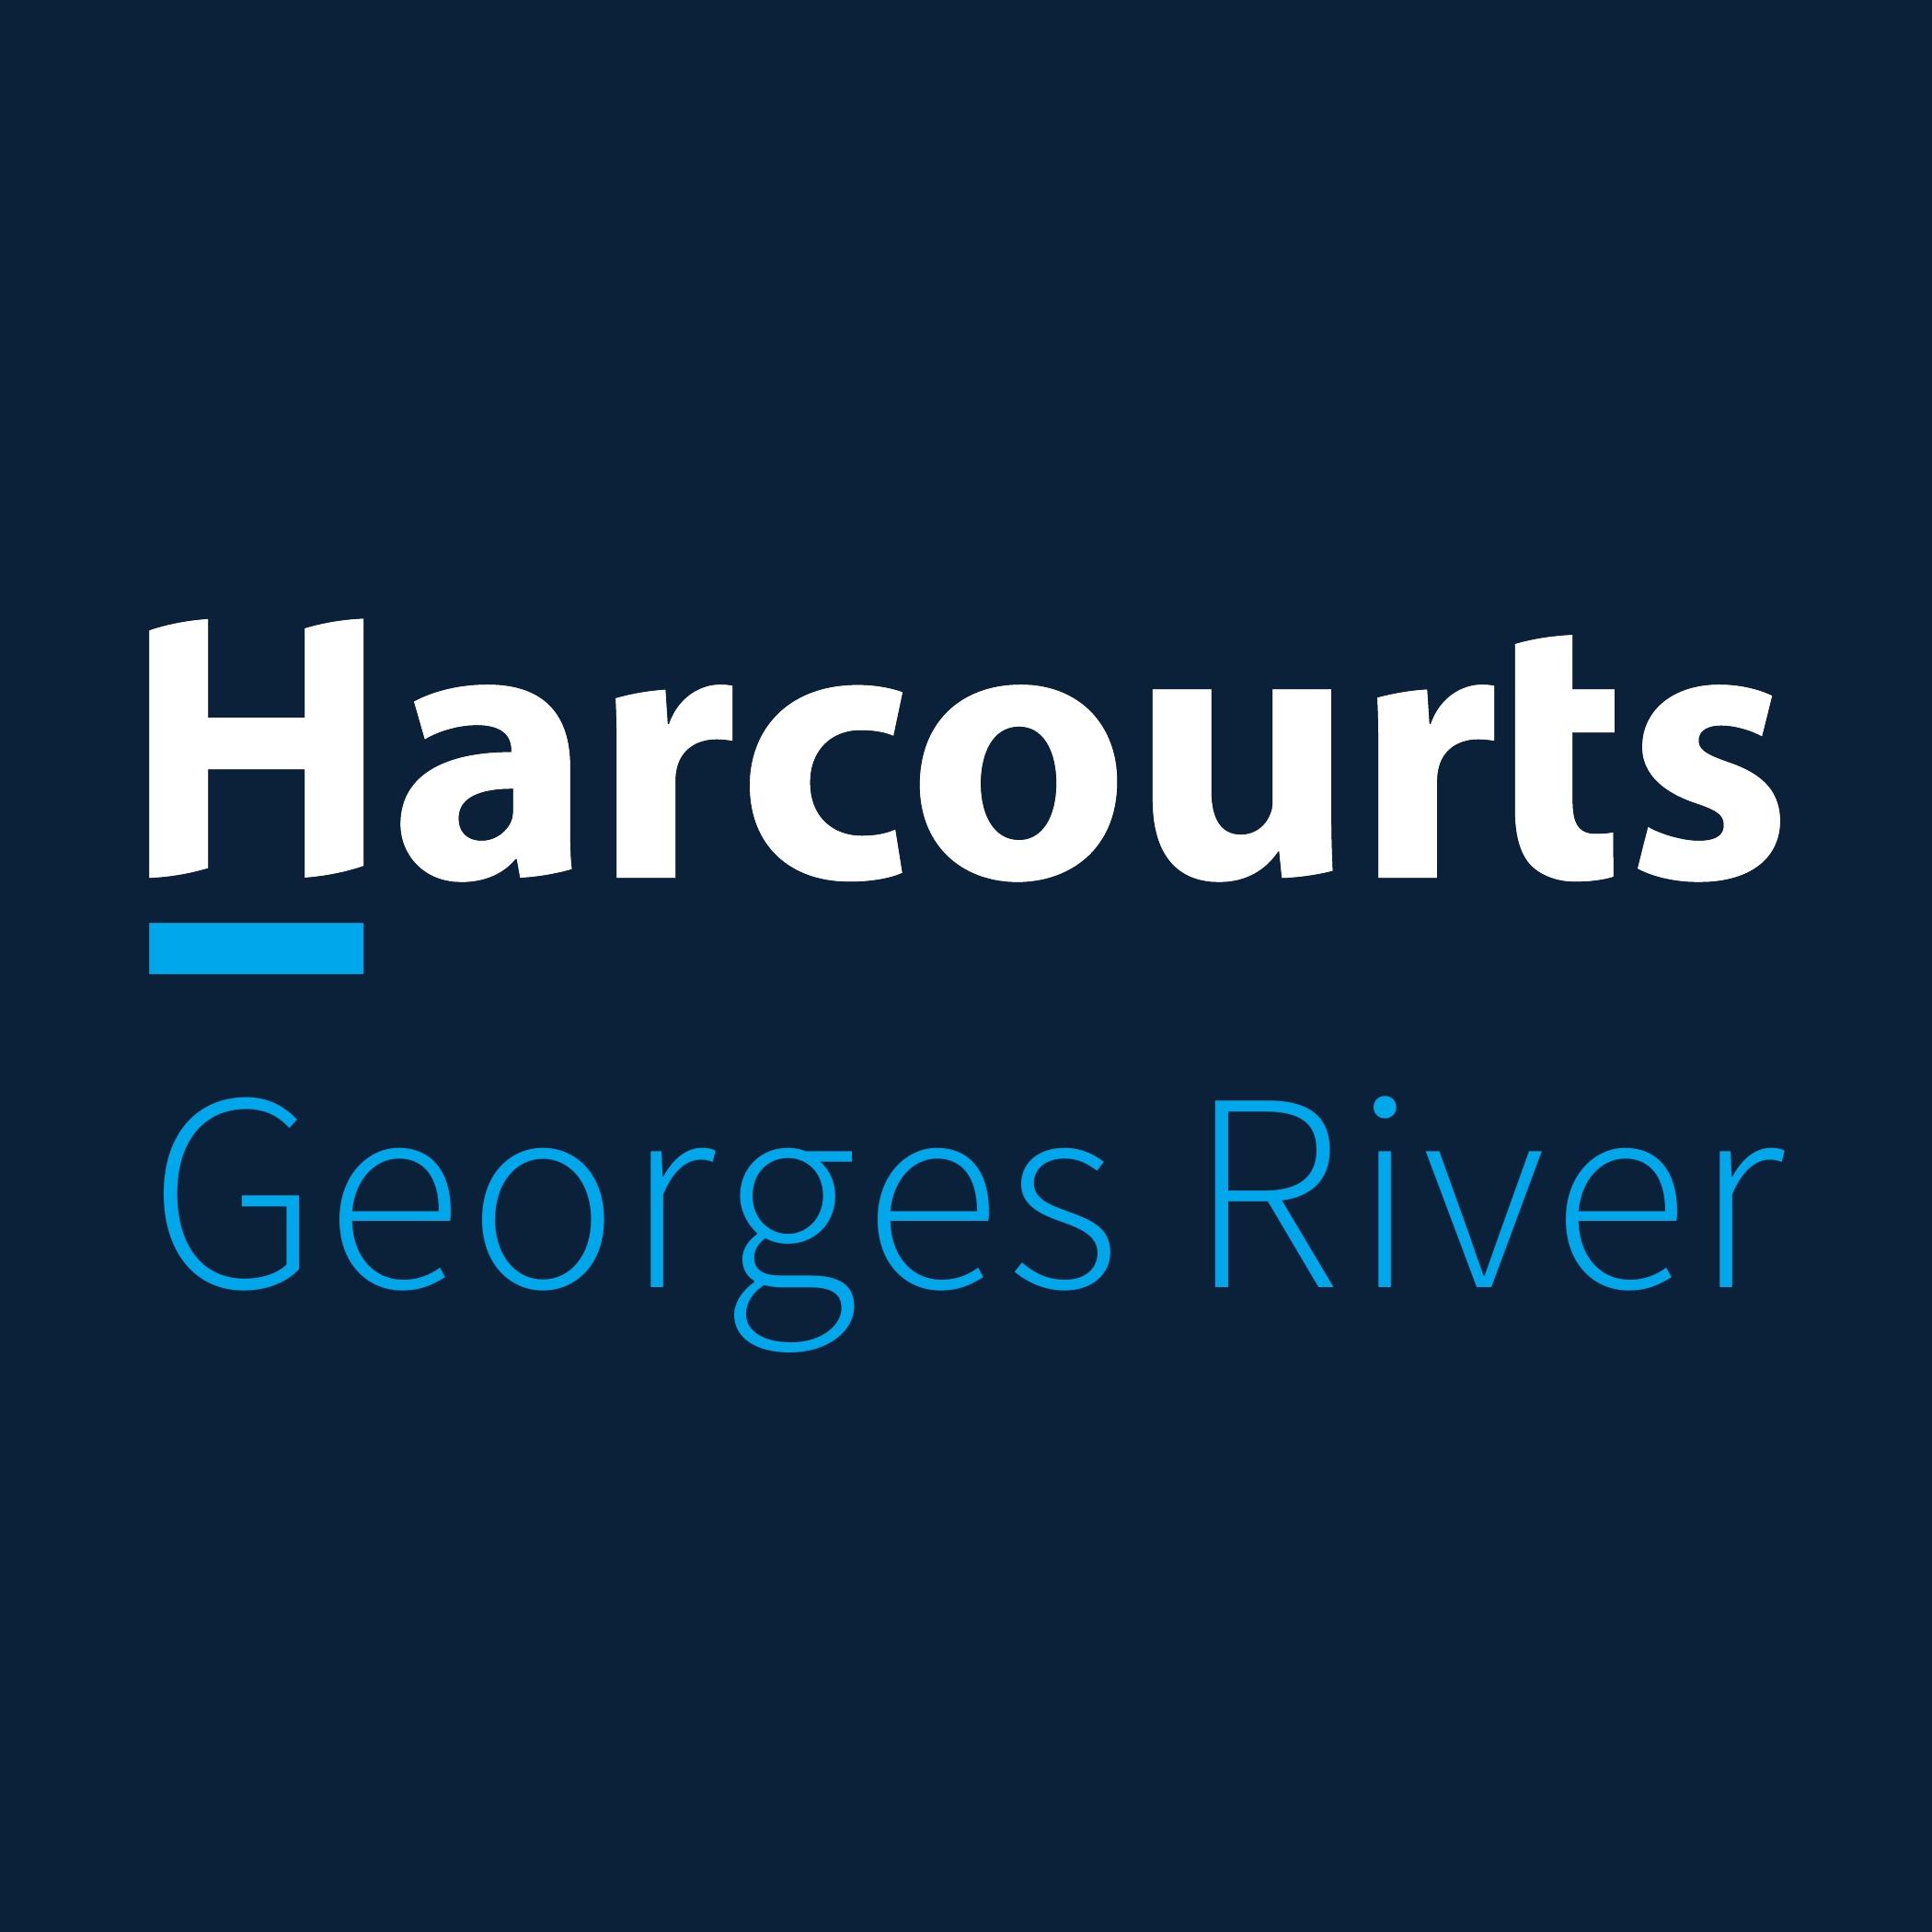 Harcourts, Penshurst, 2222